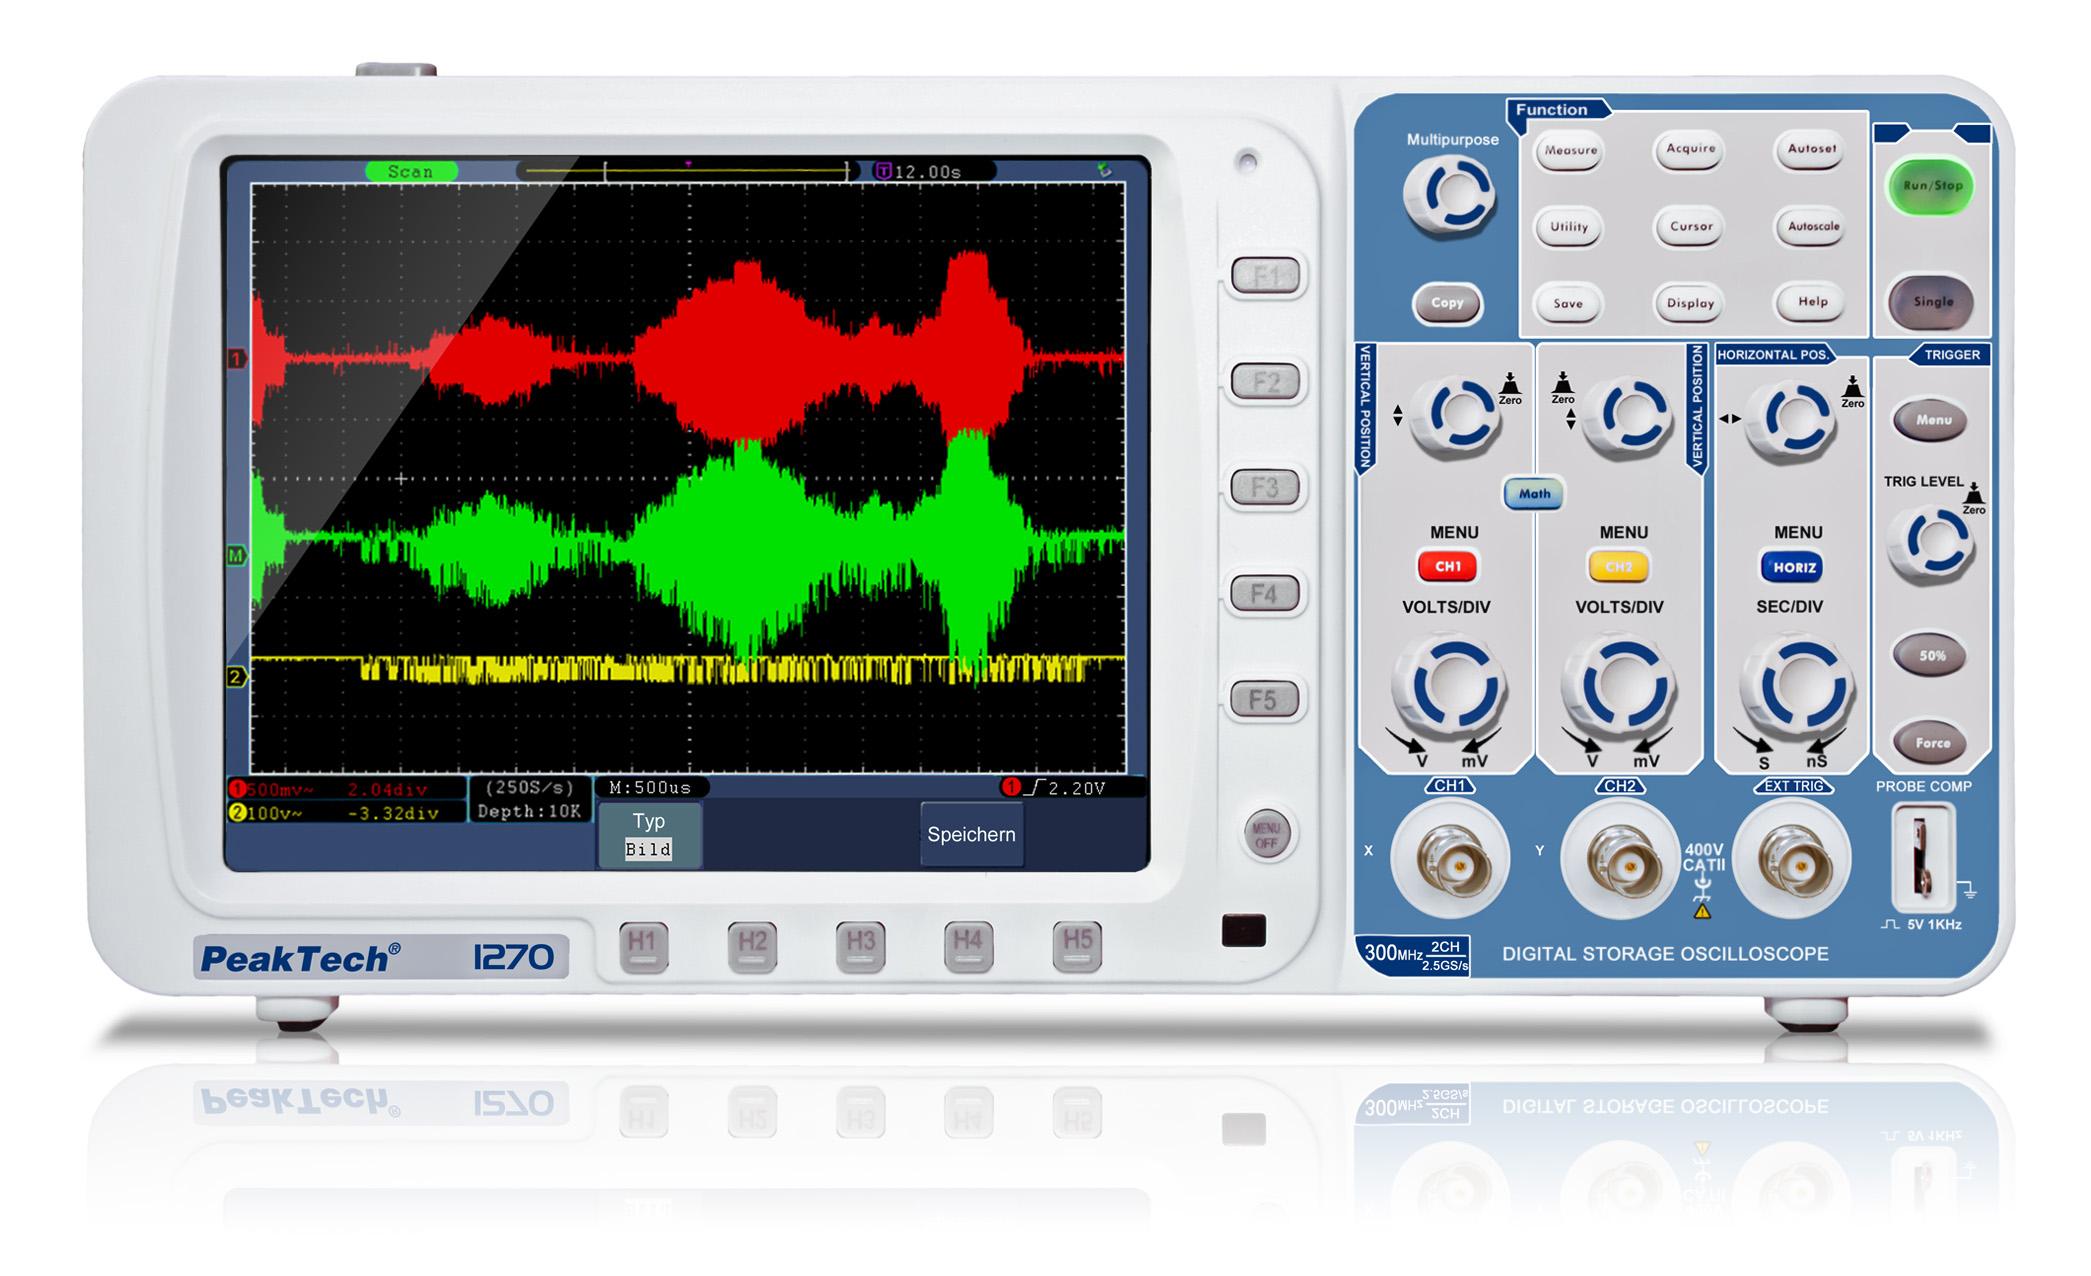 «PeakTech® P 1270» 300 MHz/2CH, 2,5 GS/s Digital Storage Oscilloscope